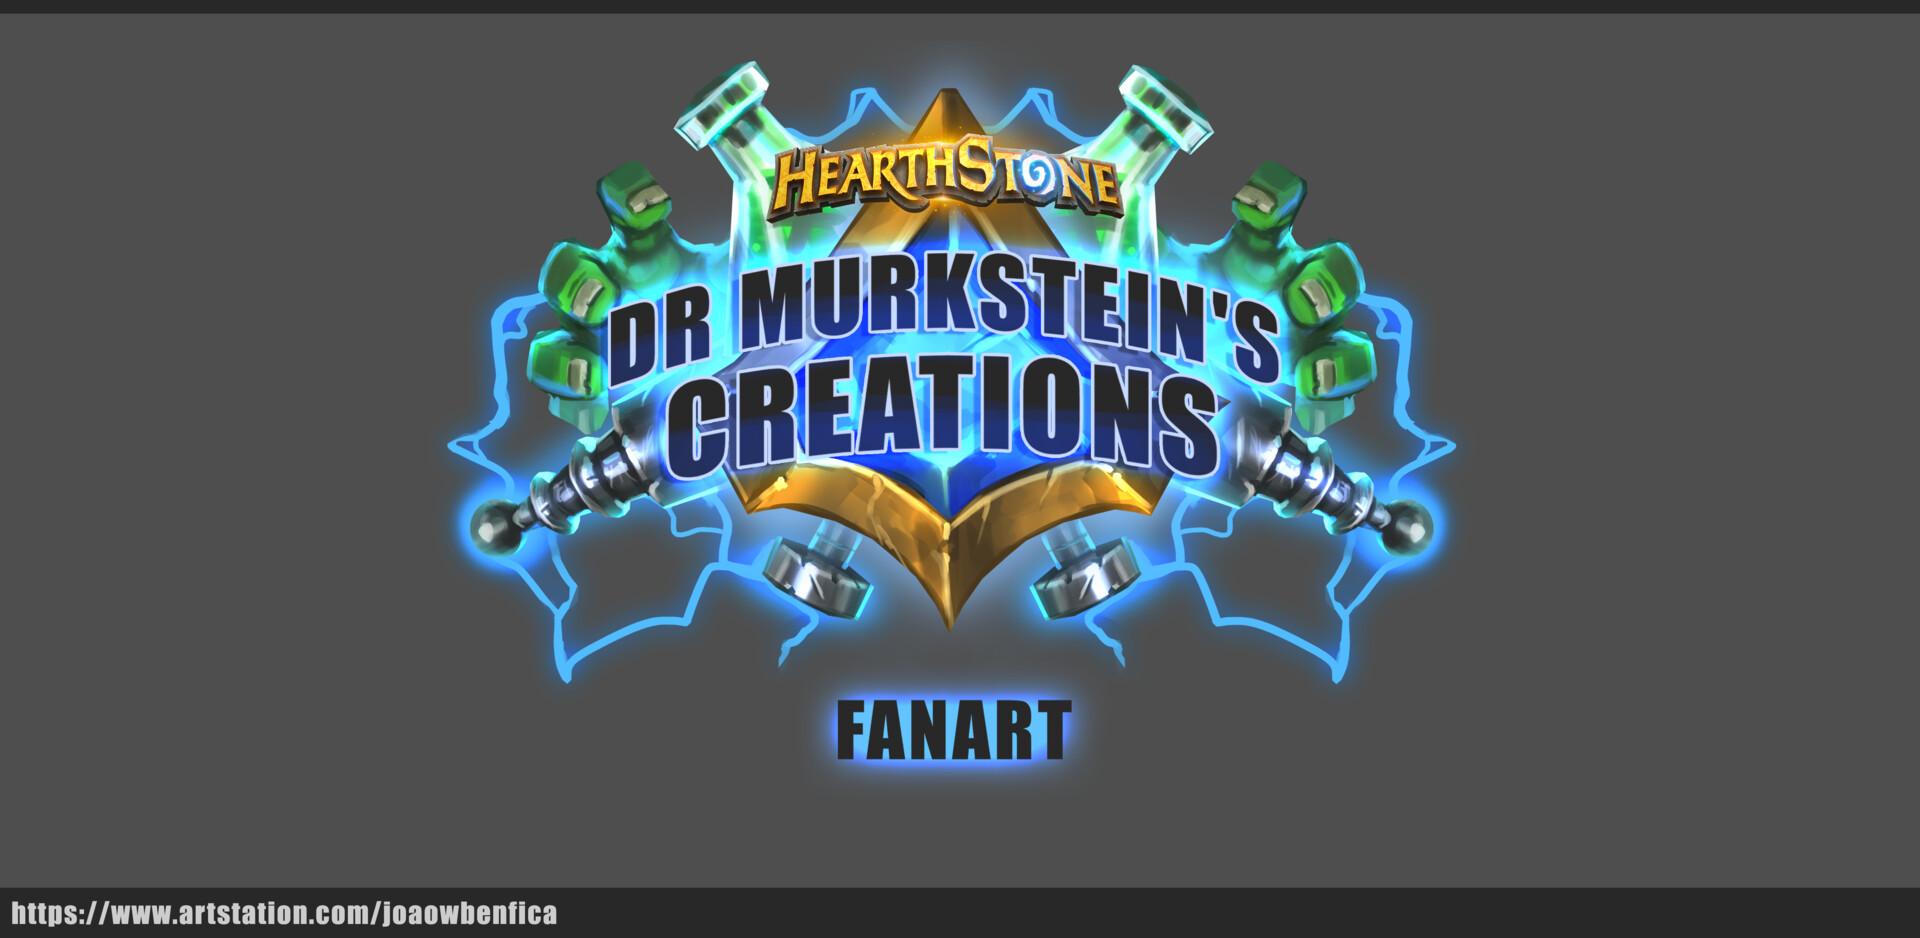 https://youre.outof.cards/media/uploads/e8/9f/e89f121e-8f15-4ecf-a497-4fd93d695eef/joao-vagner-dr-murlocstein-logo.jpg